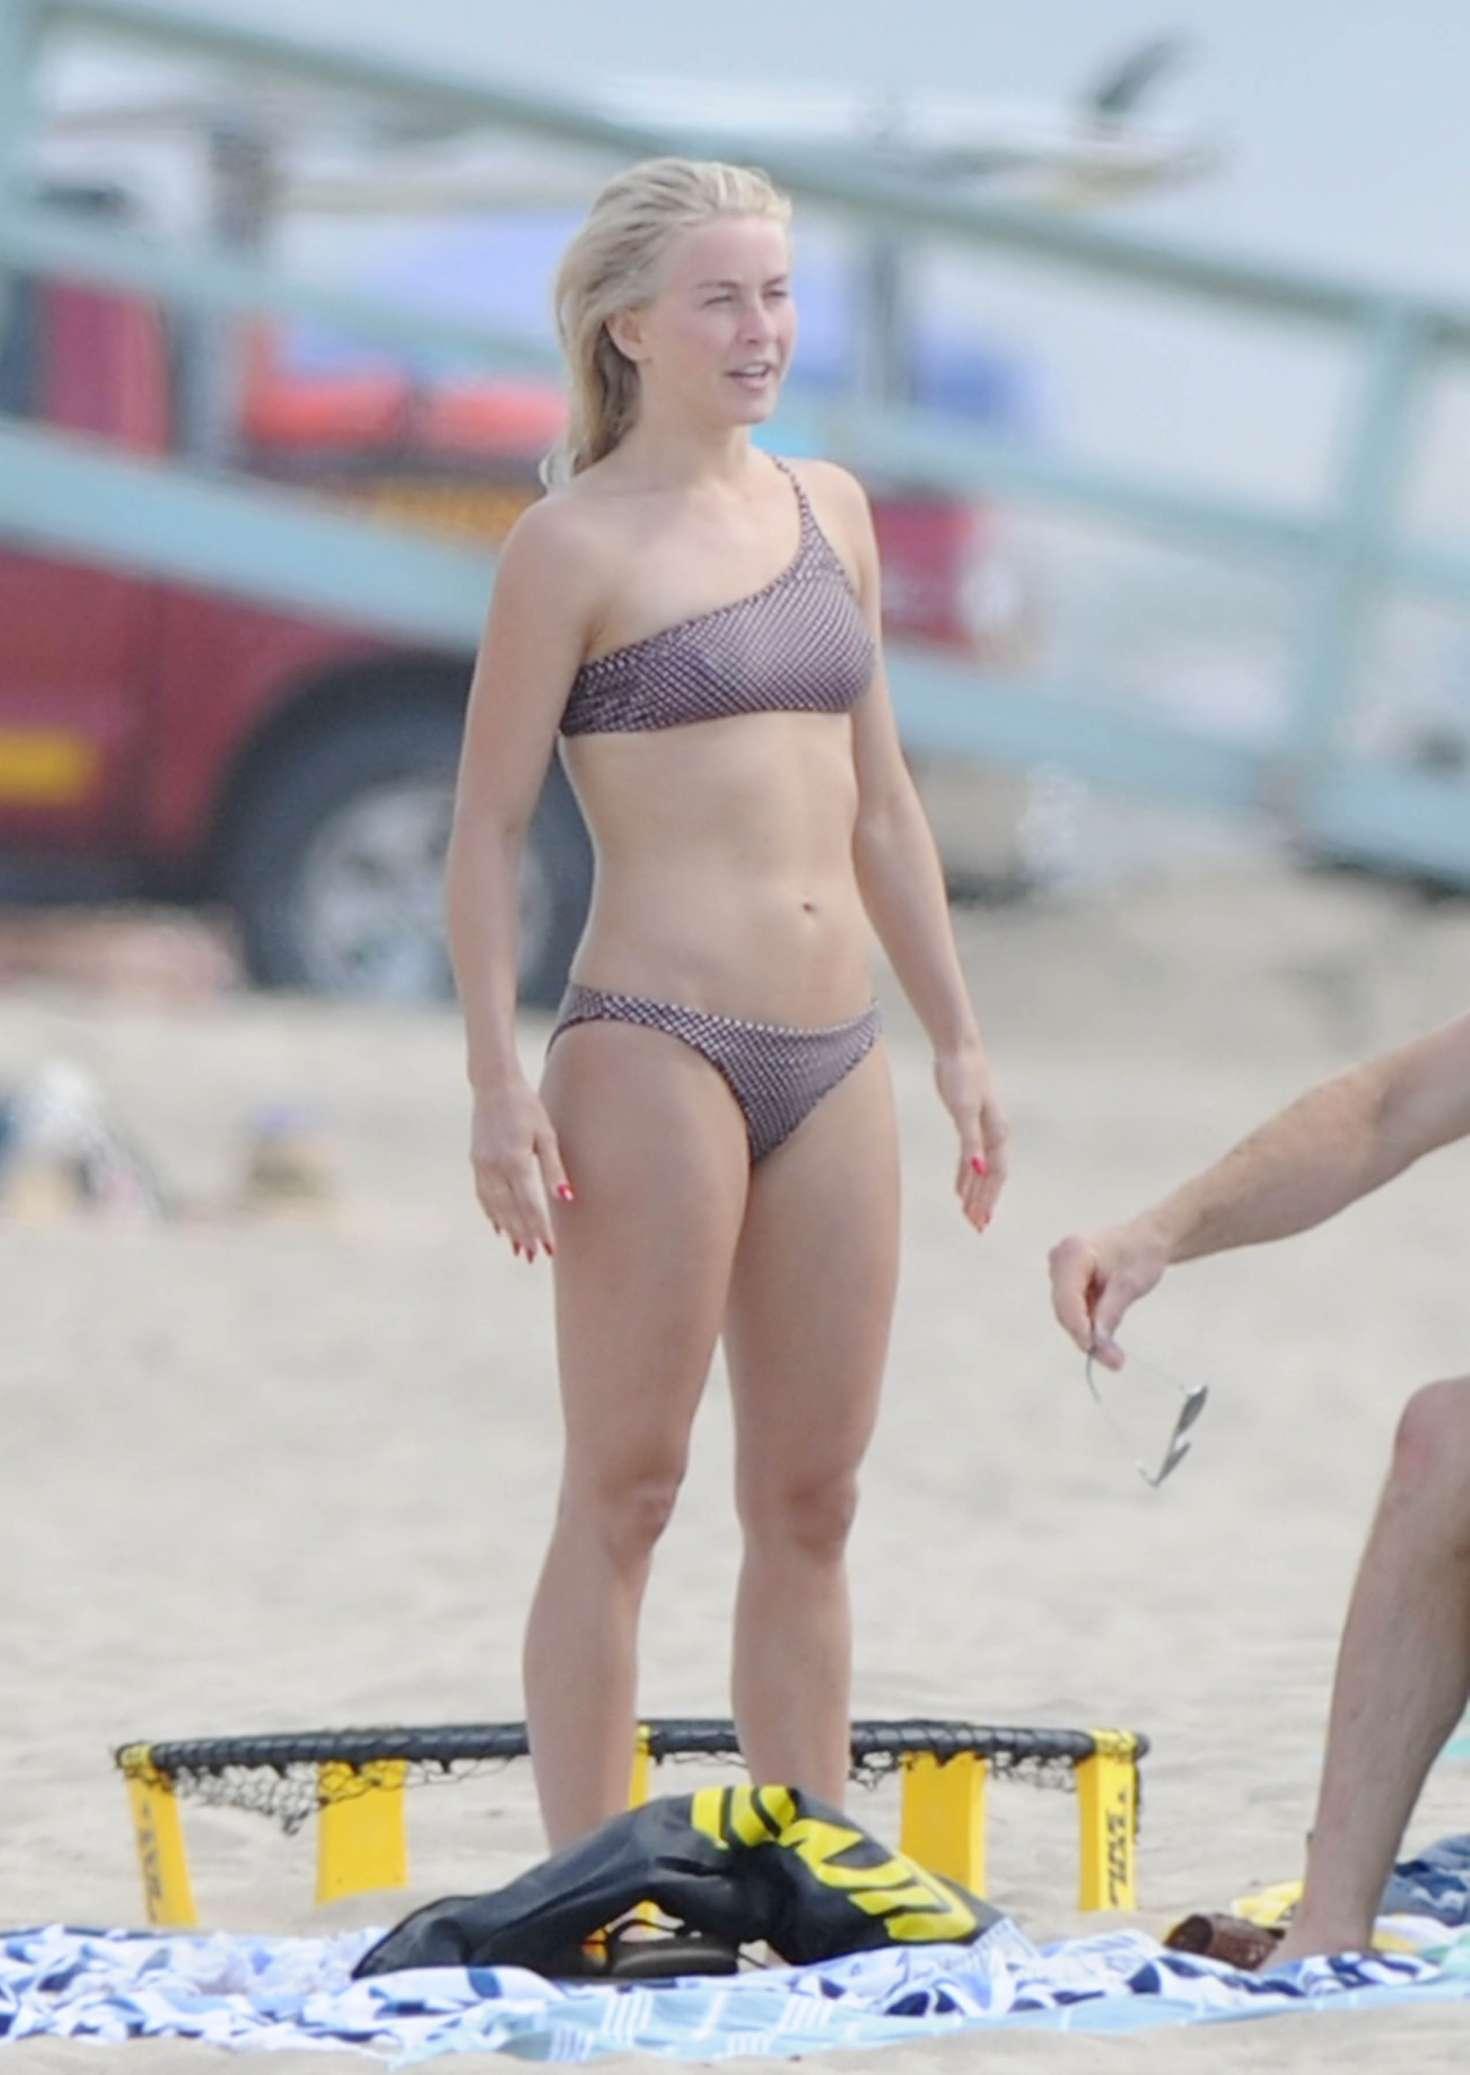 Julianne Hough 2017 : Julianne Hough: Bikini with husband Brooks Laich at the beach in Manhattan Beach-36